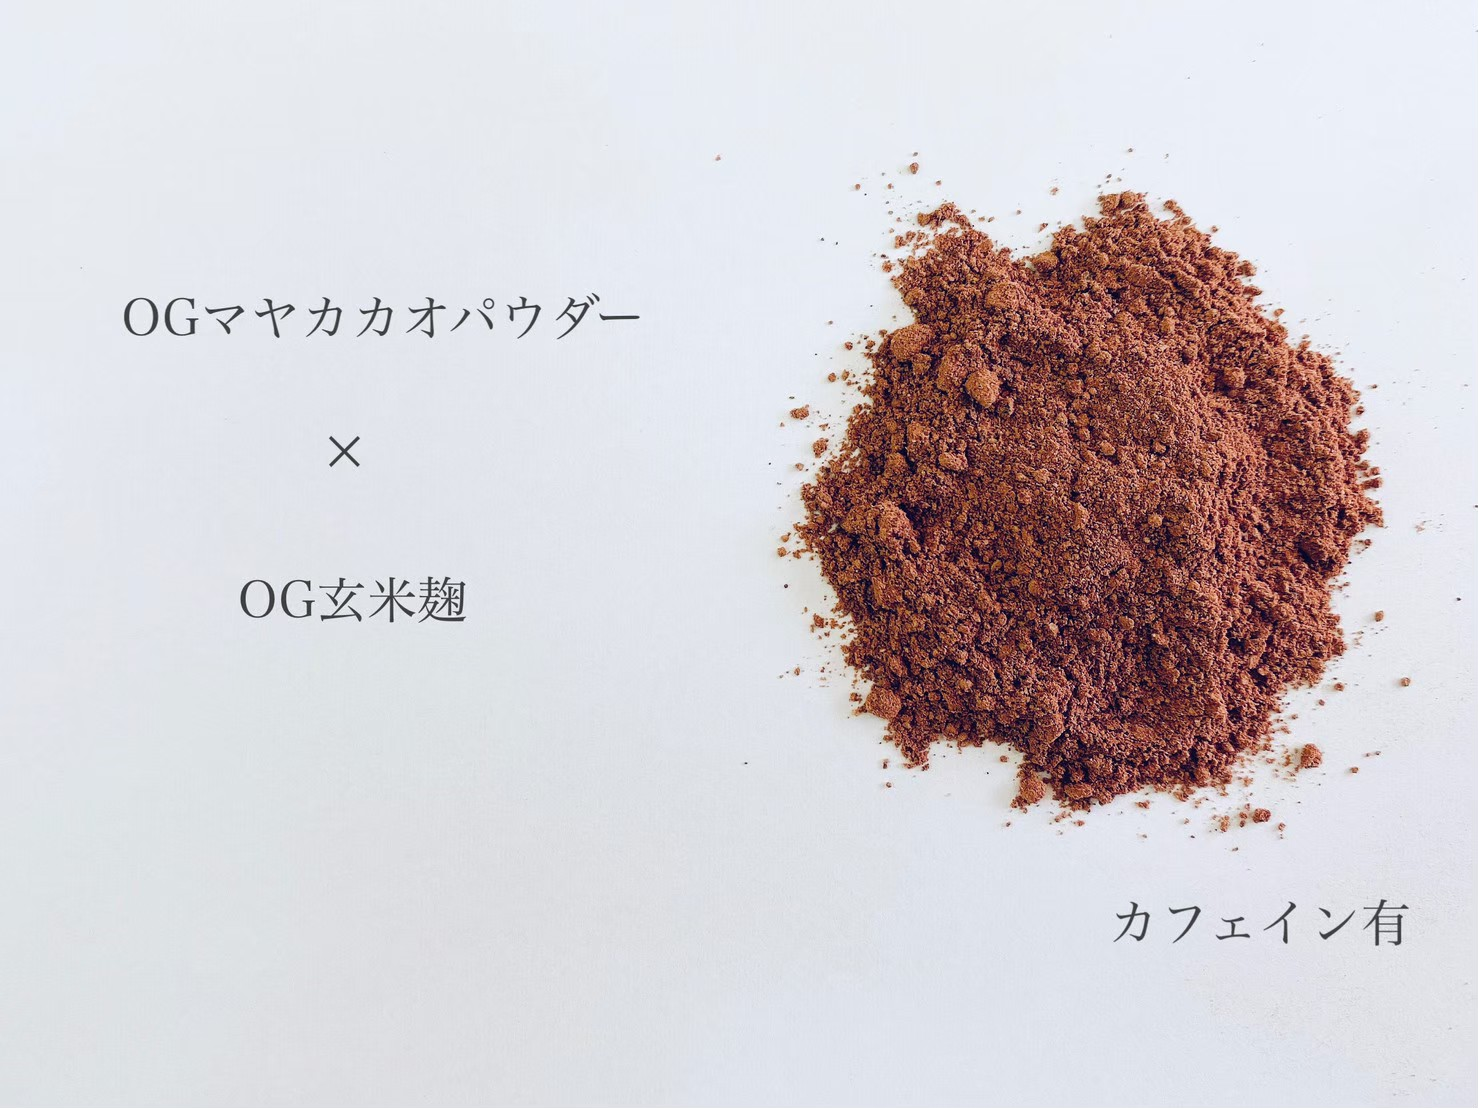 ★【Black Label】 カカオパウダー